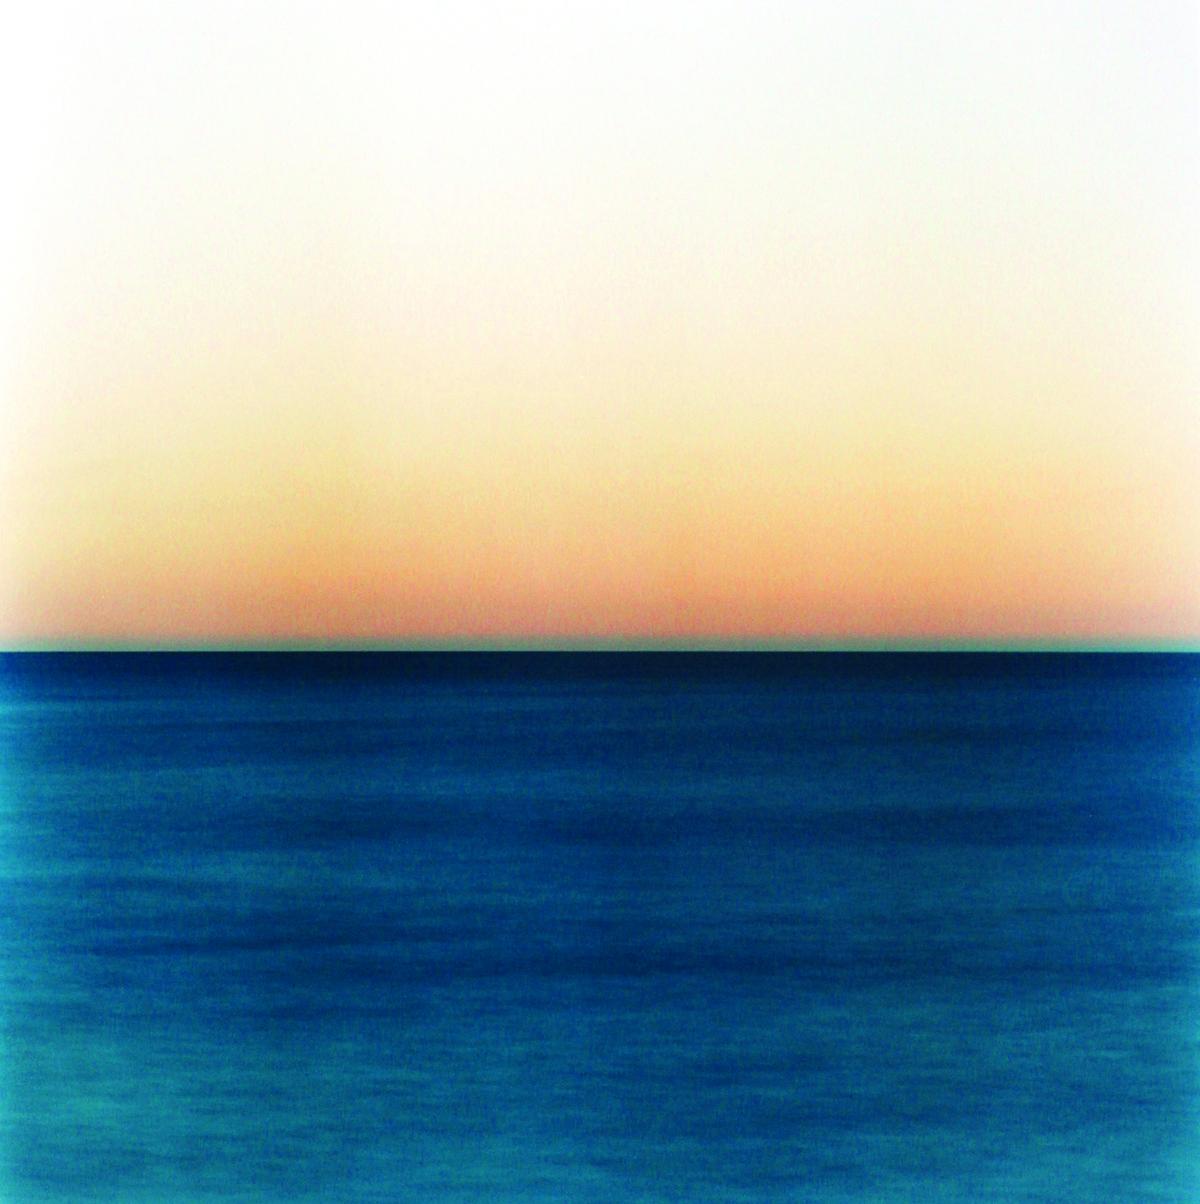 Wake, by Iain Stewart, 2000